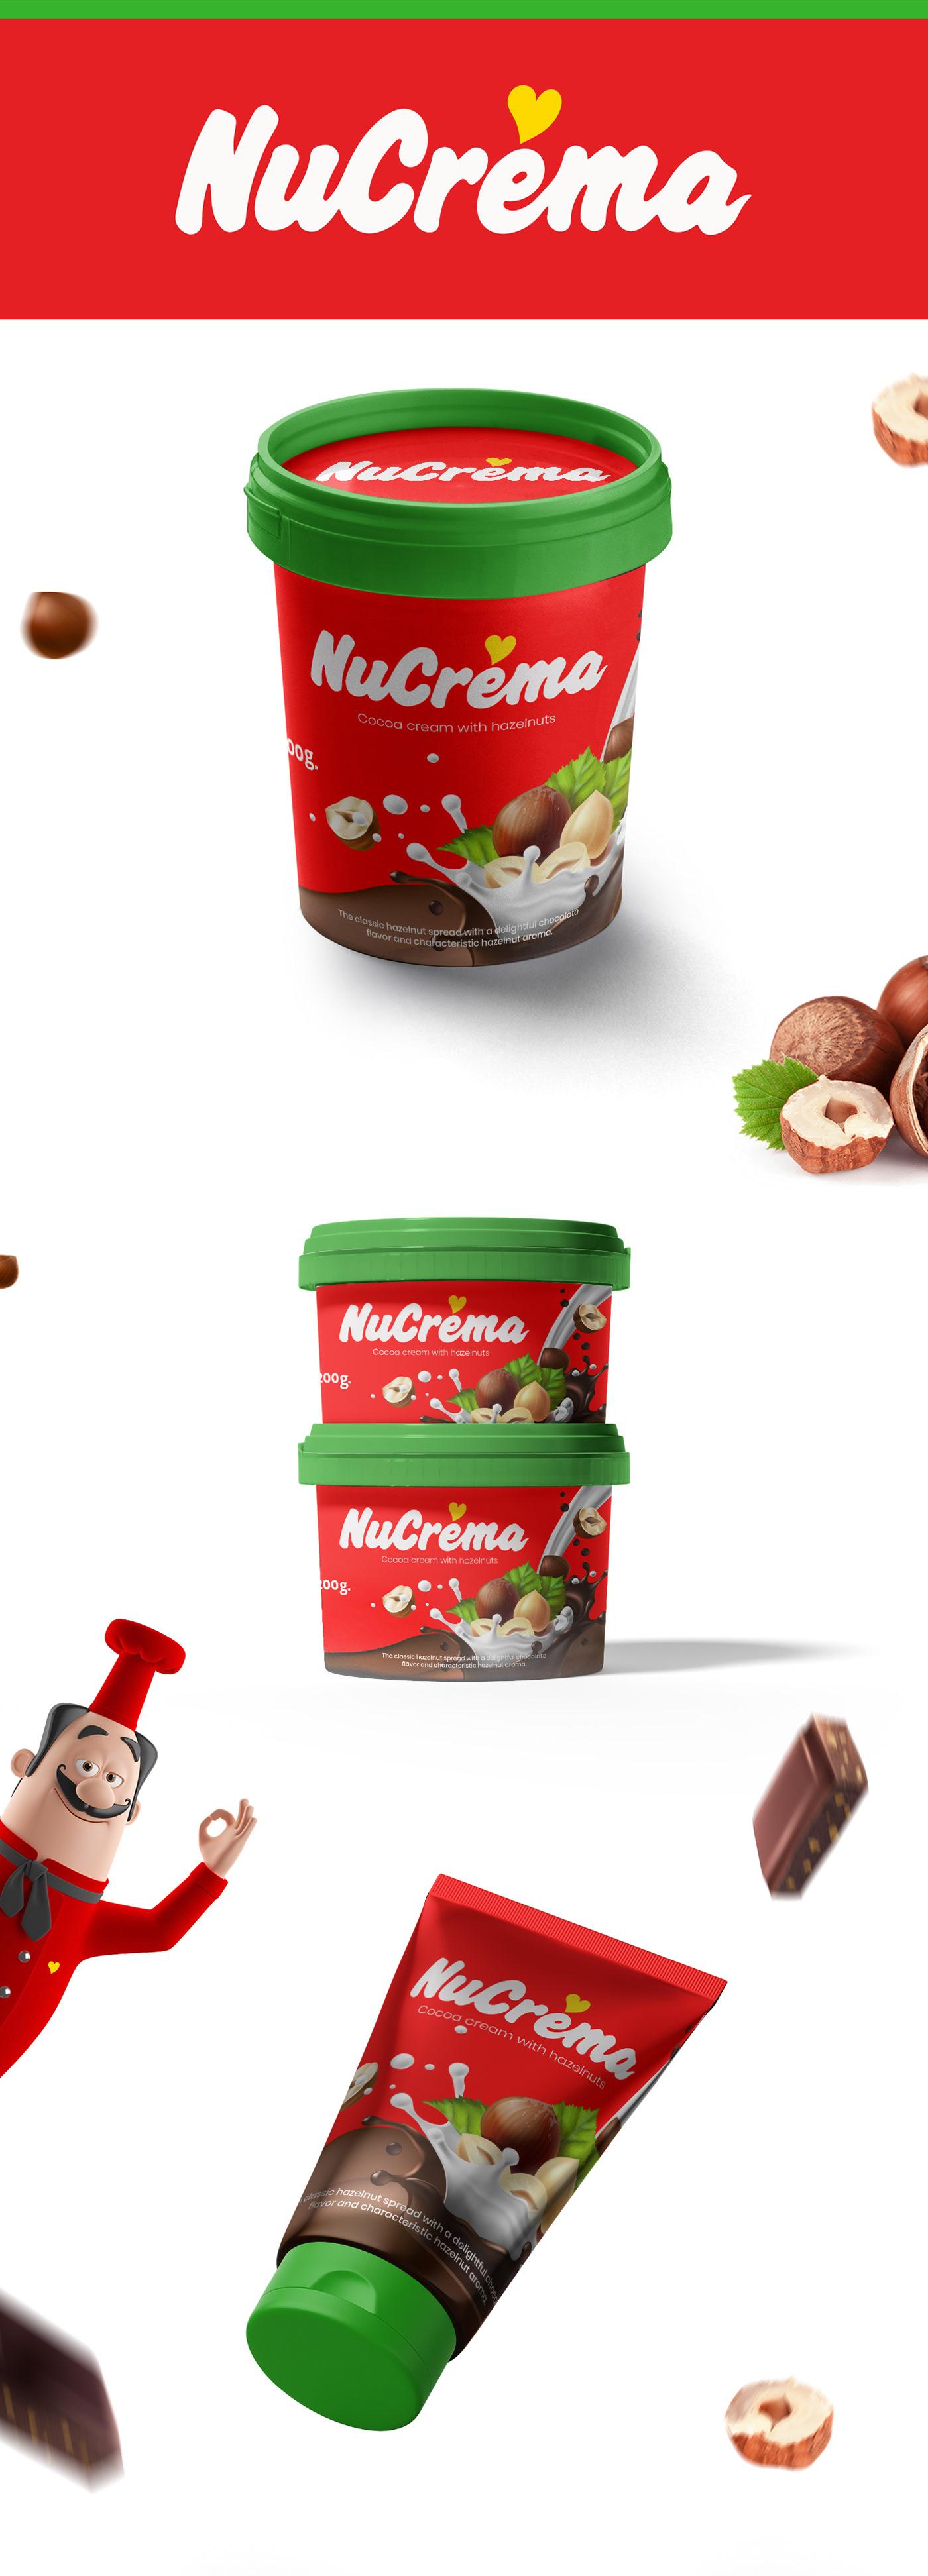 chocolate nutella spread hazelnut Packaging Nucrema modern red identity Cadbury